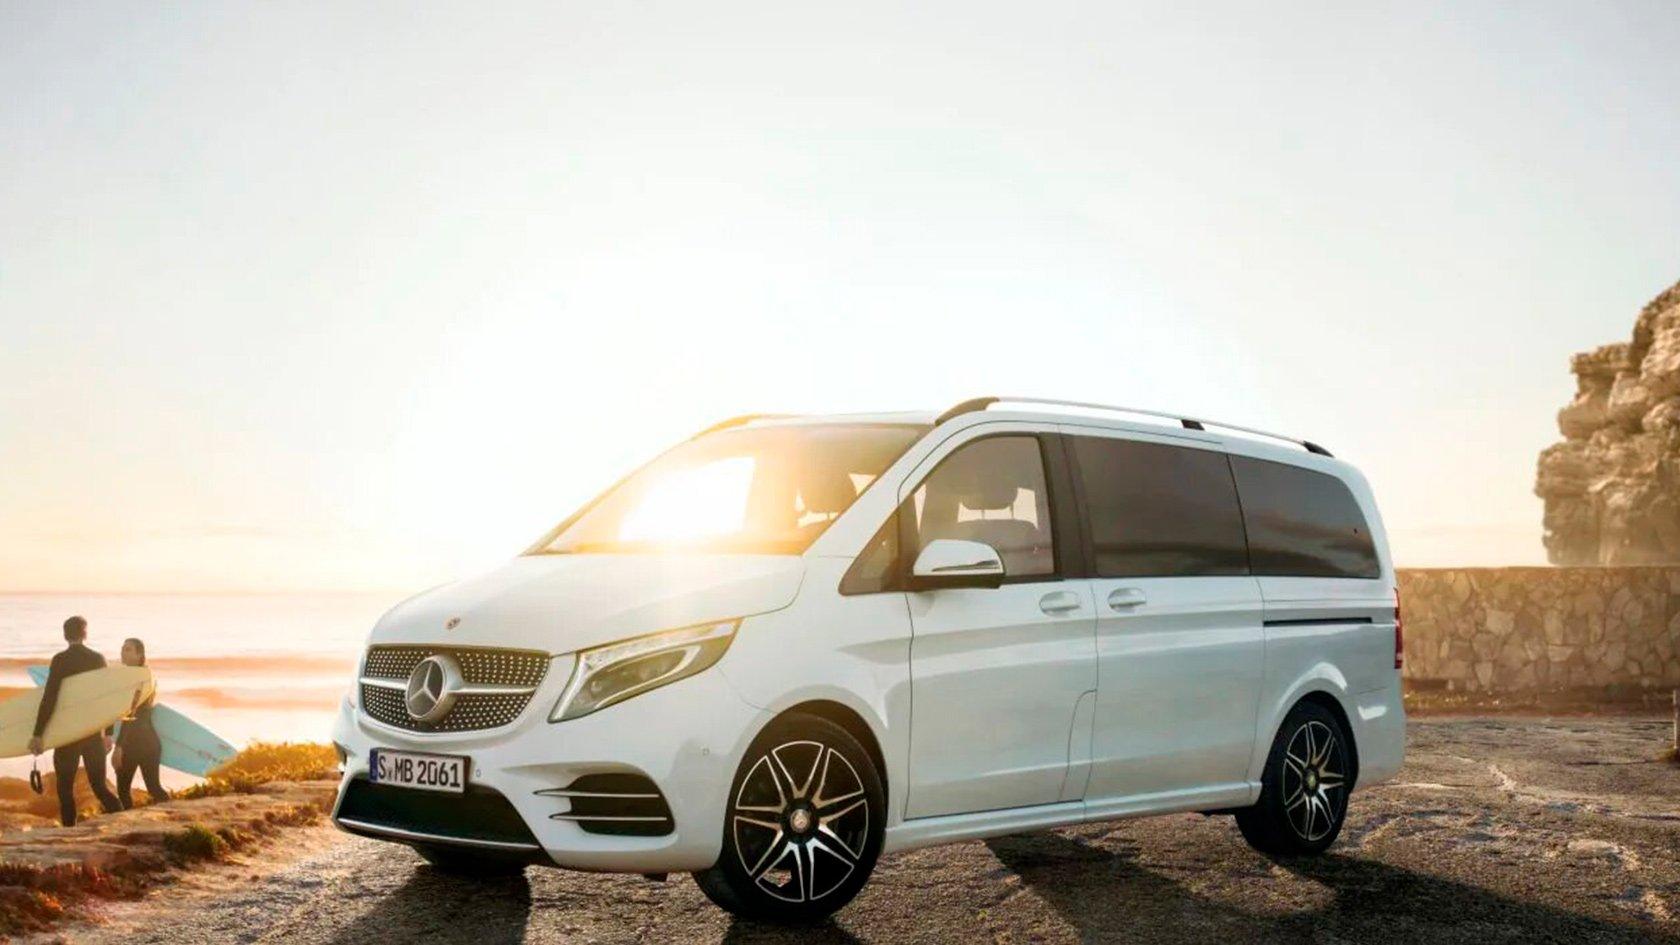 Акционные условия на Mercedes-Benz Vito и Mercedes-Benz V-Class